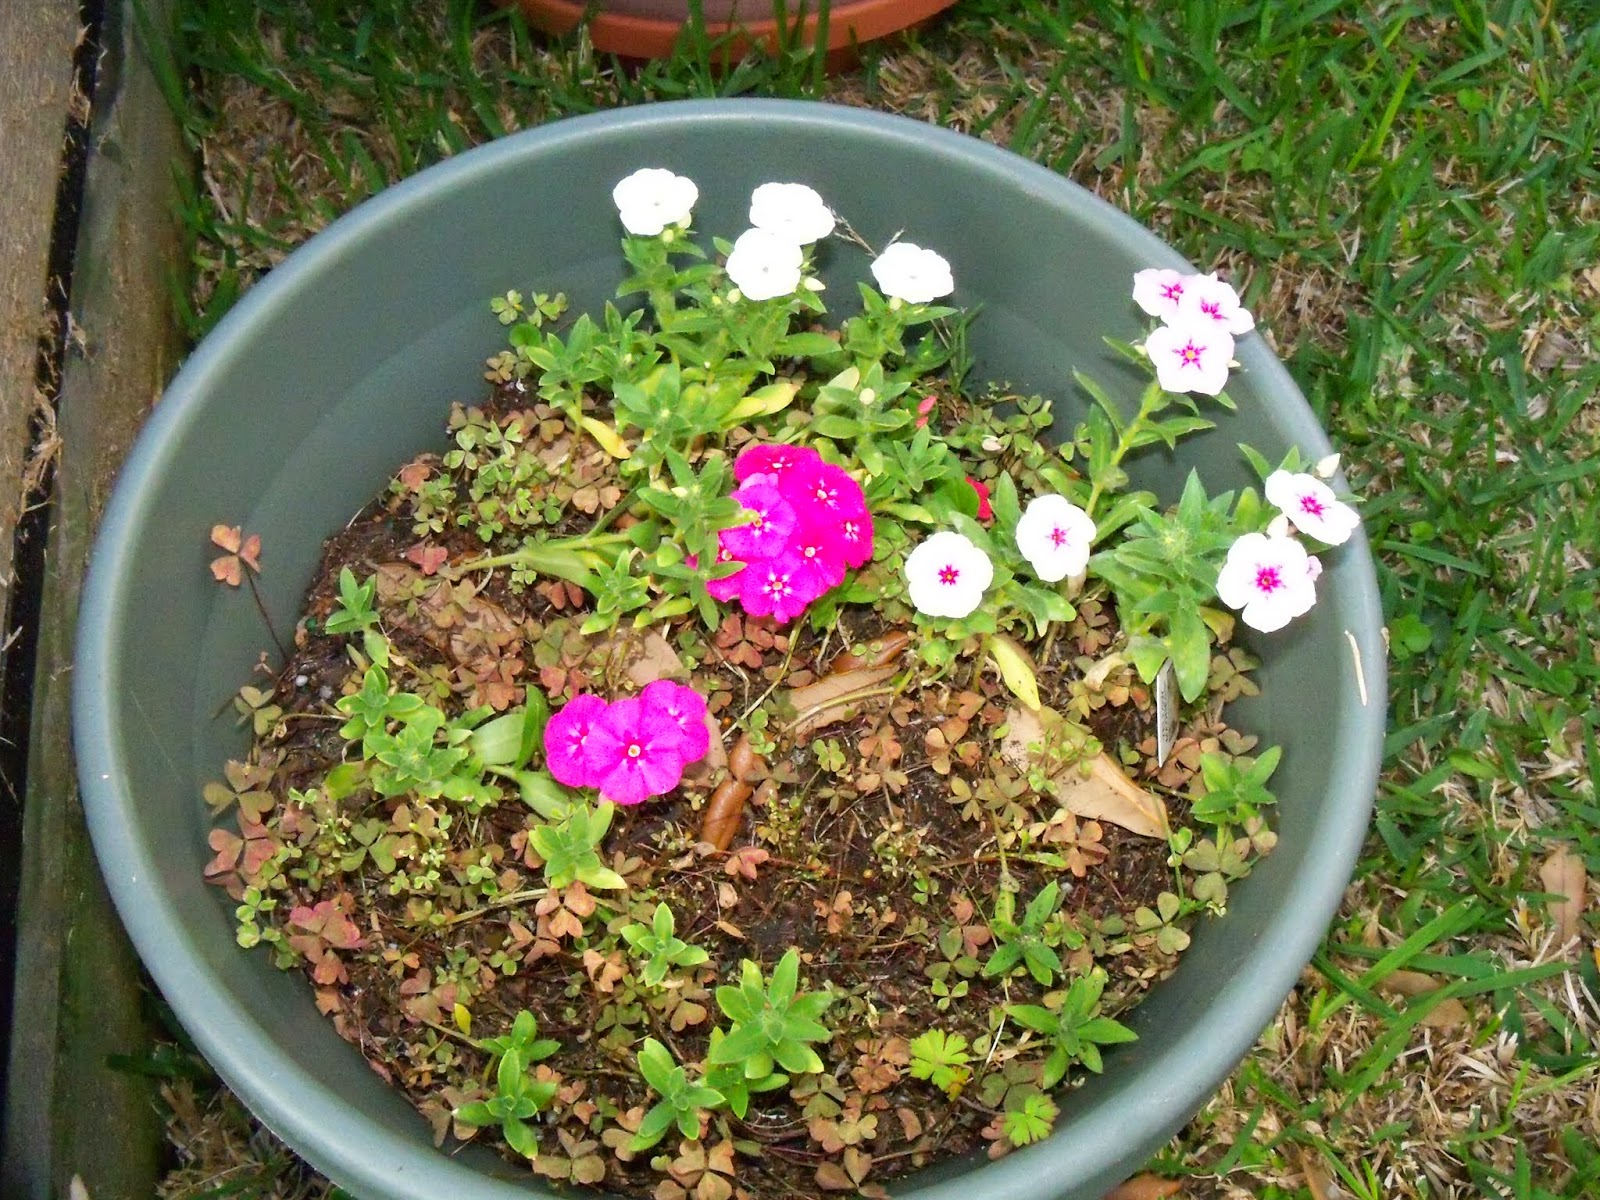 Gardening 2015 - 116_7695.JPG